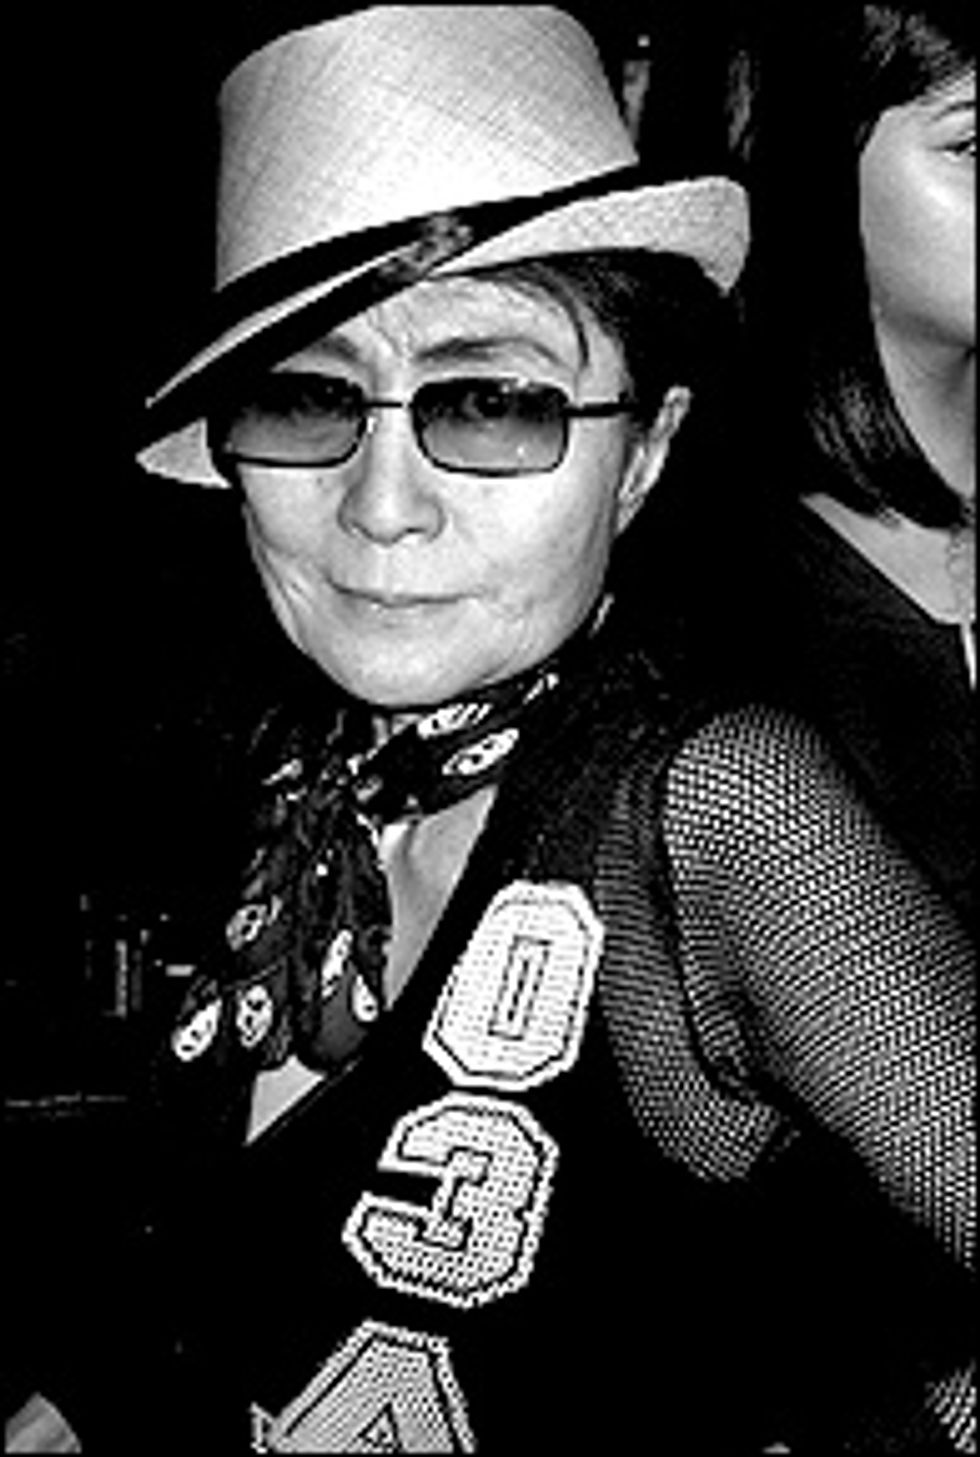 MisShapes Disco with Hedi Slimane and Yoko Ono